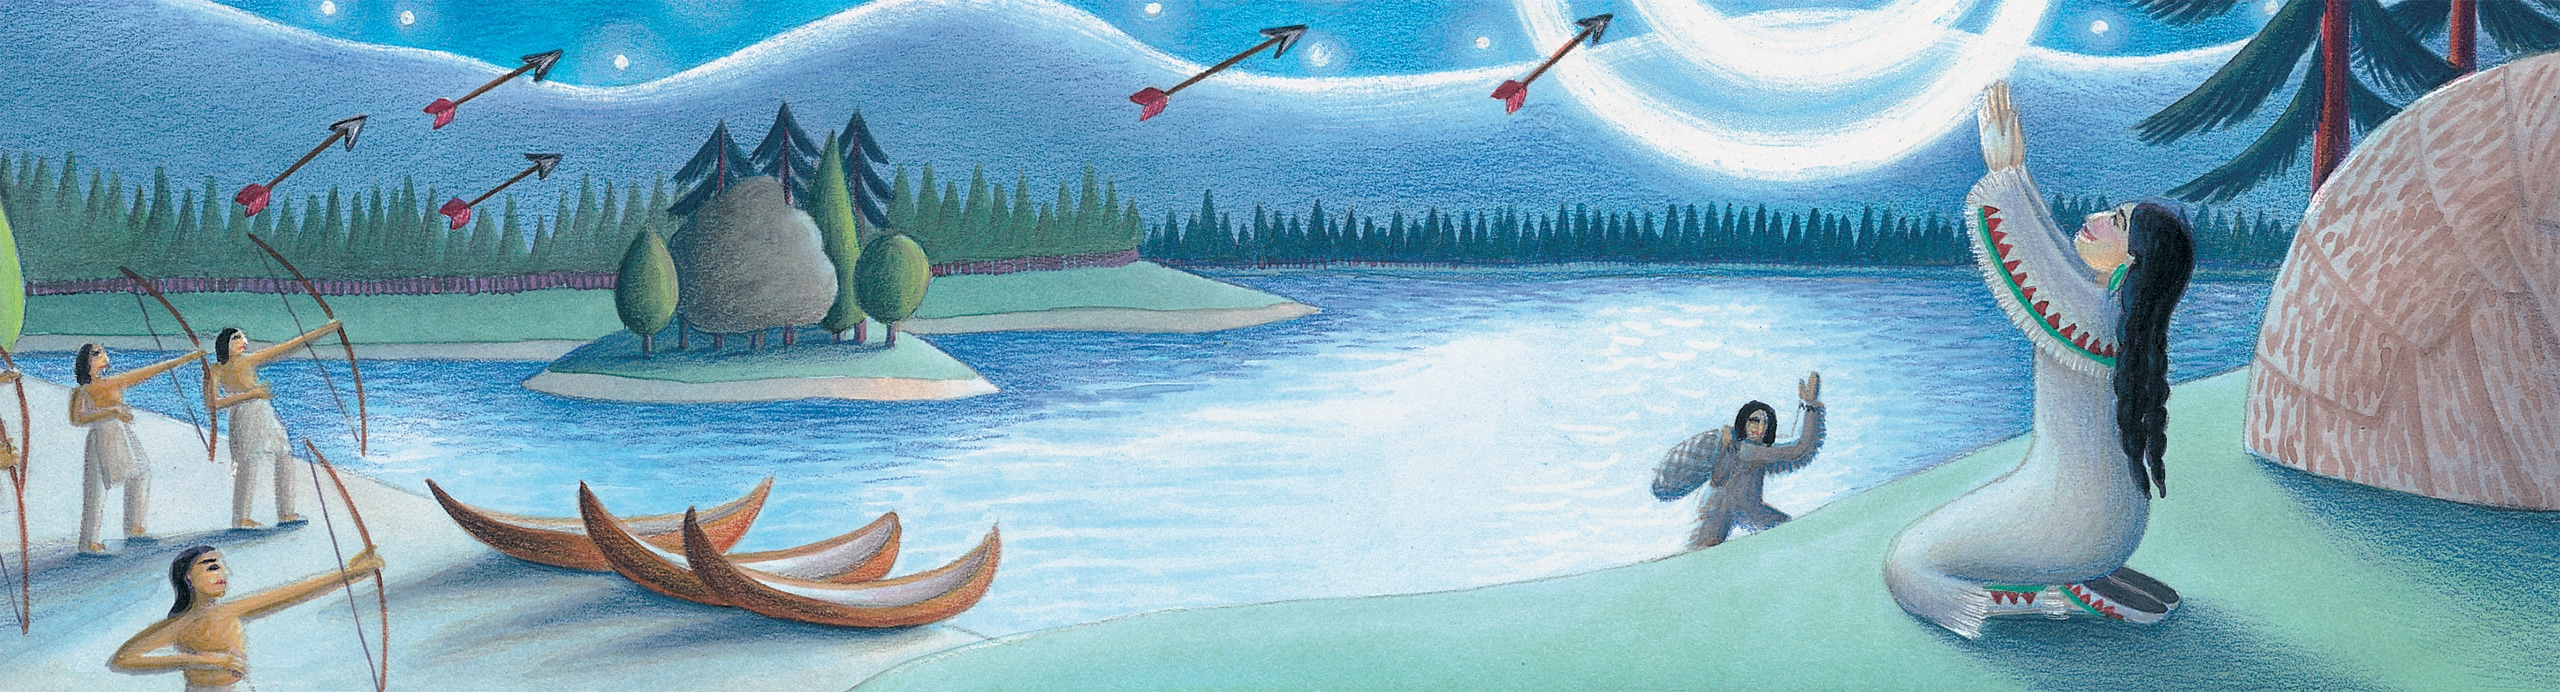 Illustrations for Children's Picture Books Banner Image